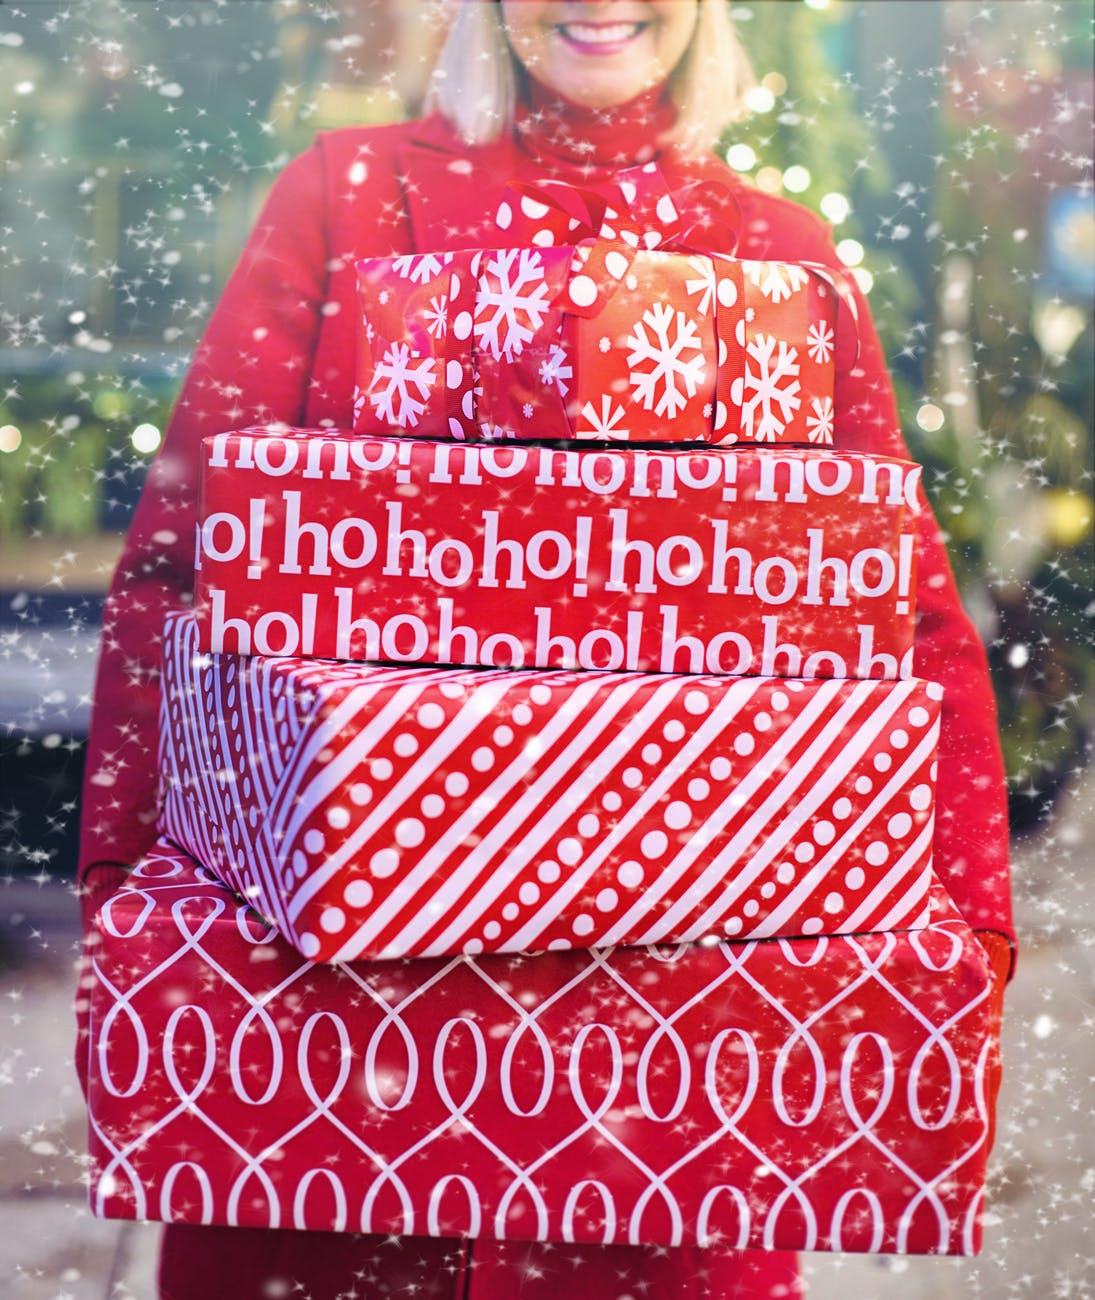 ChristmasWomenwithgifts - Merry Christmas!